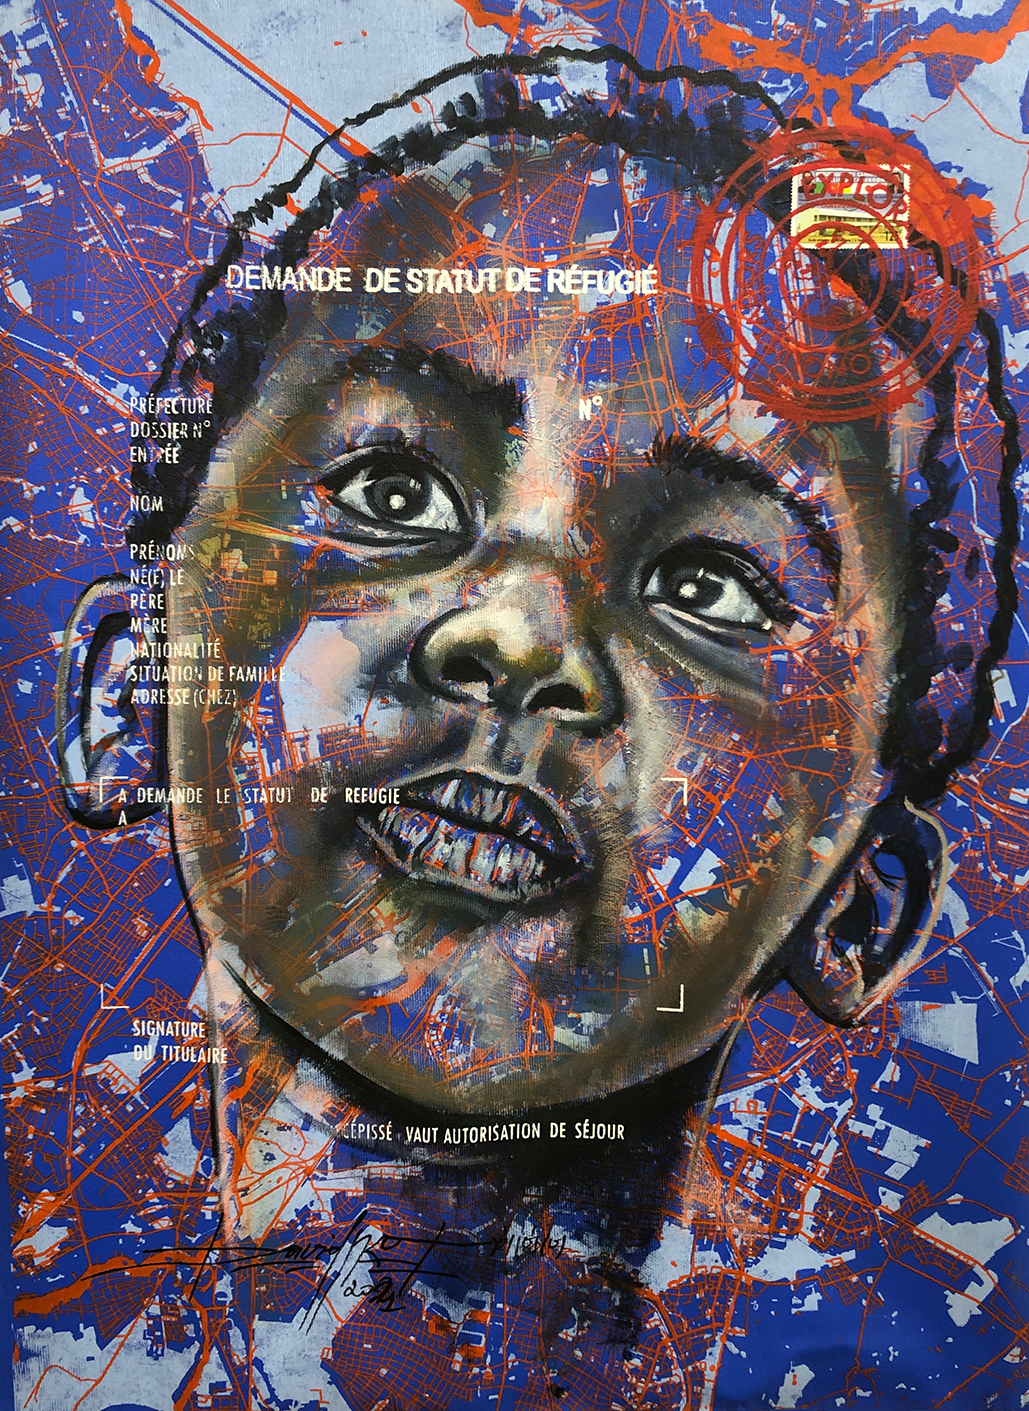 Jean David Nkot, 'www.look of hopes@.com #8', 2021, acrylic, posca and silkscreen printing on canvas. Courtesy of AFIKARIS Gallery